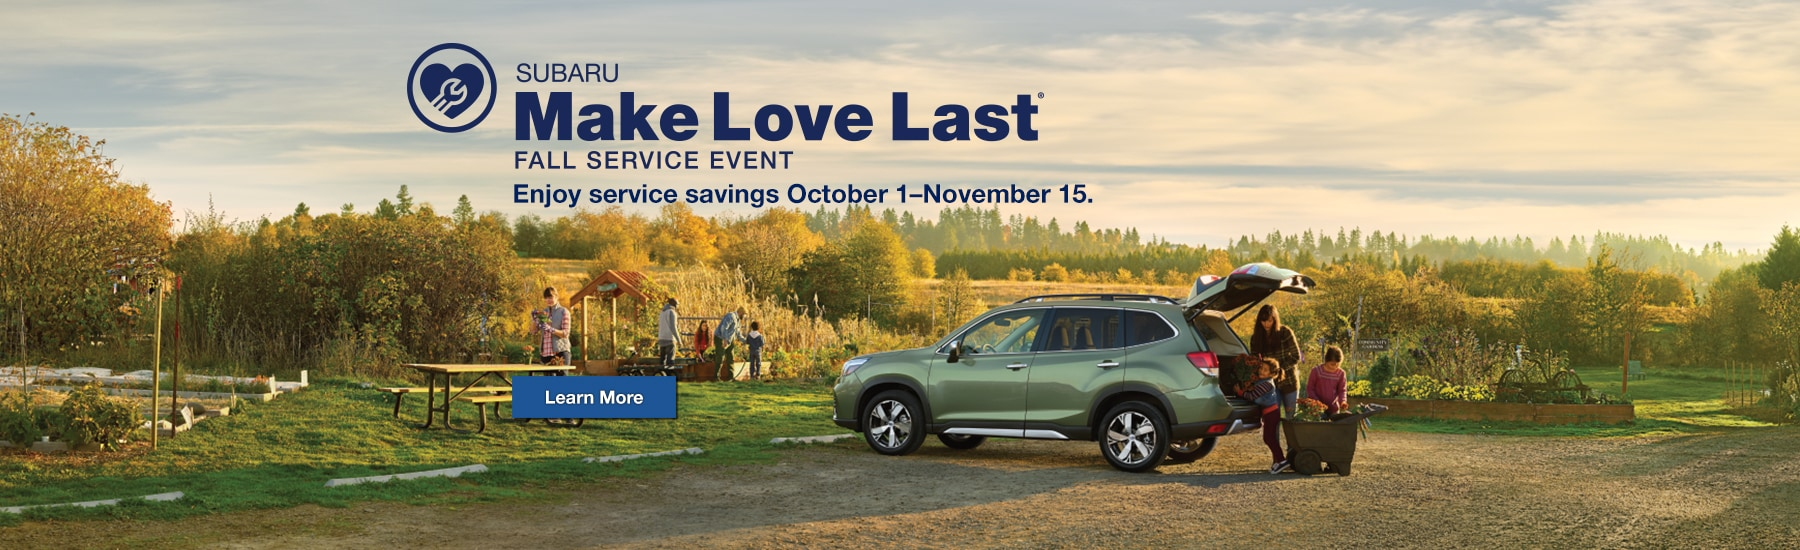 Outback Tupelo Ms >> Paul Moak Subaru New 2019 2020 Subaru Used Car Dealer